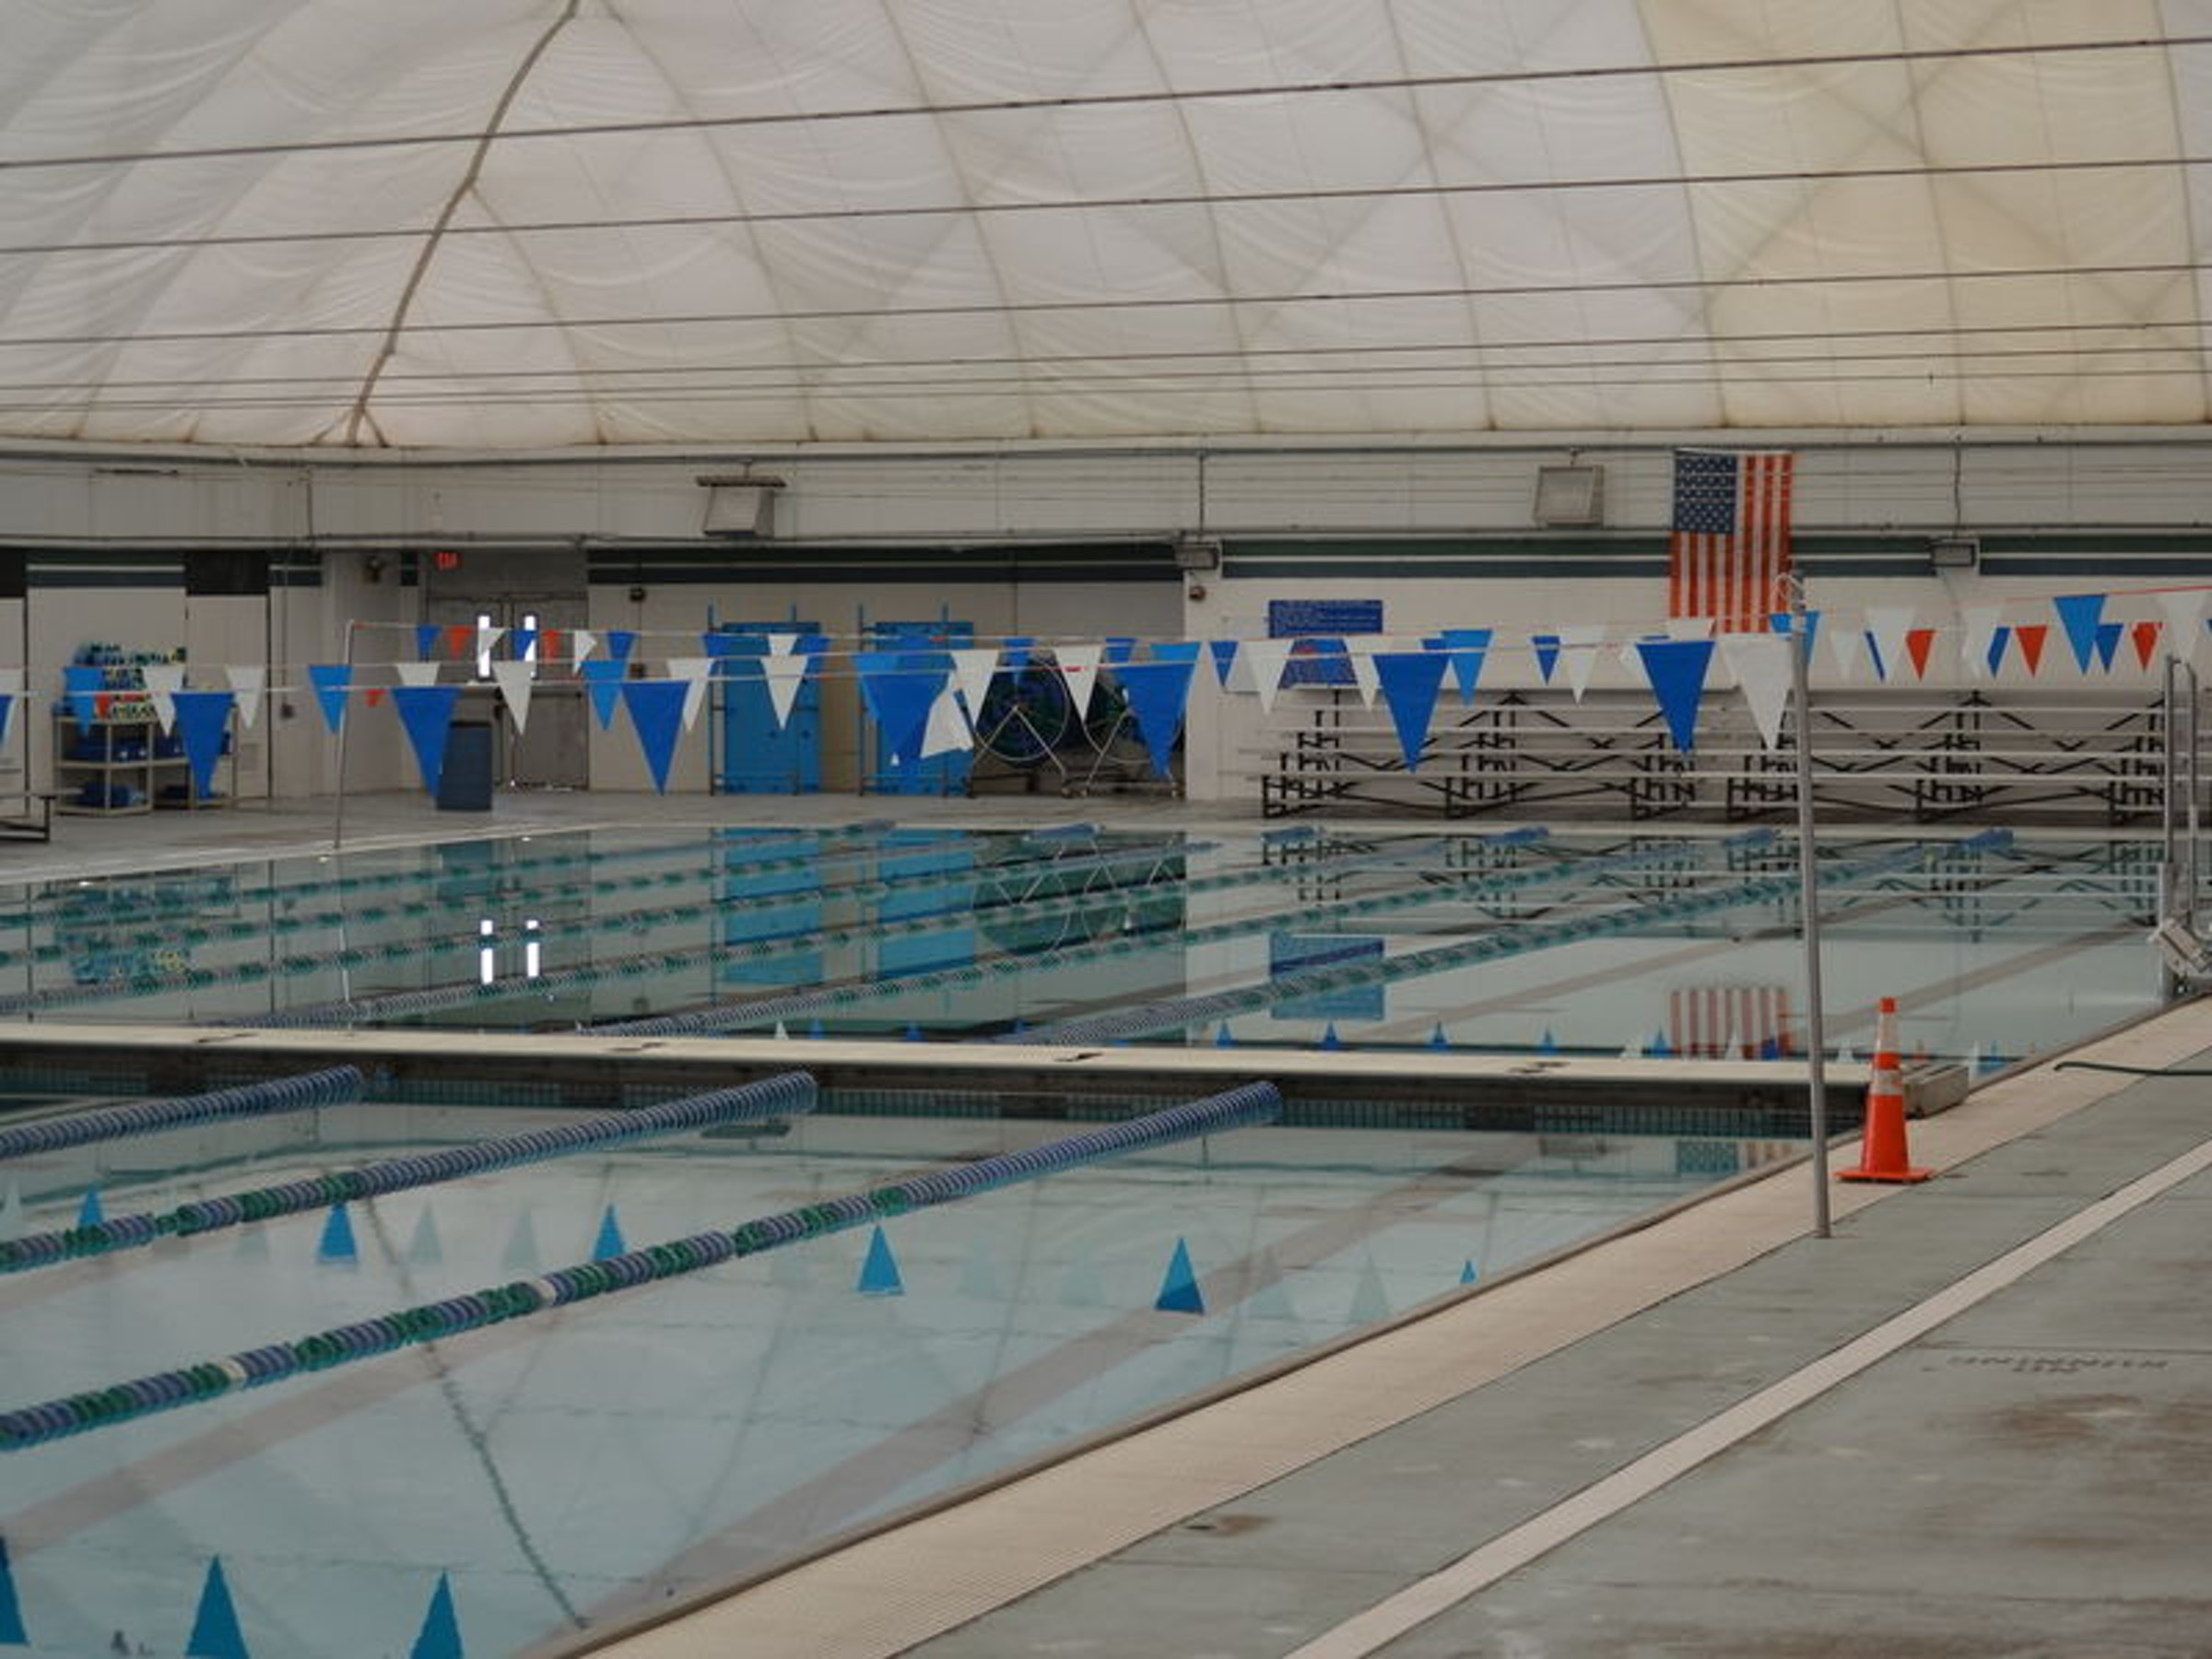 Northlake Aquatic Center in Beyond Dallas